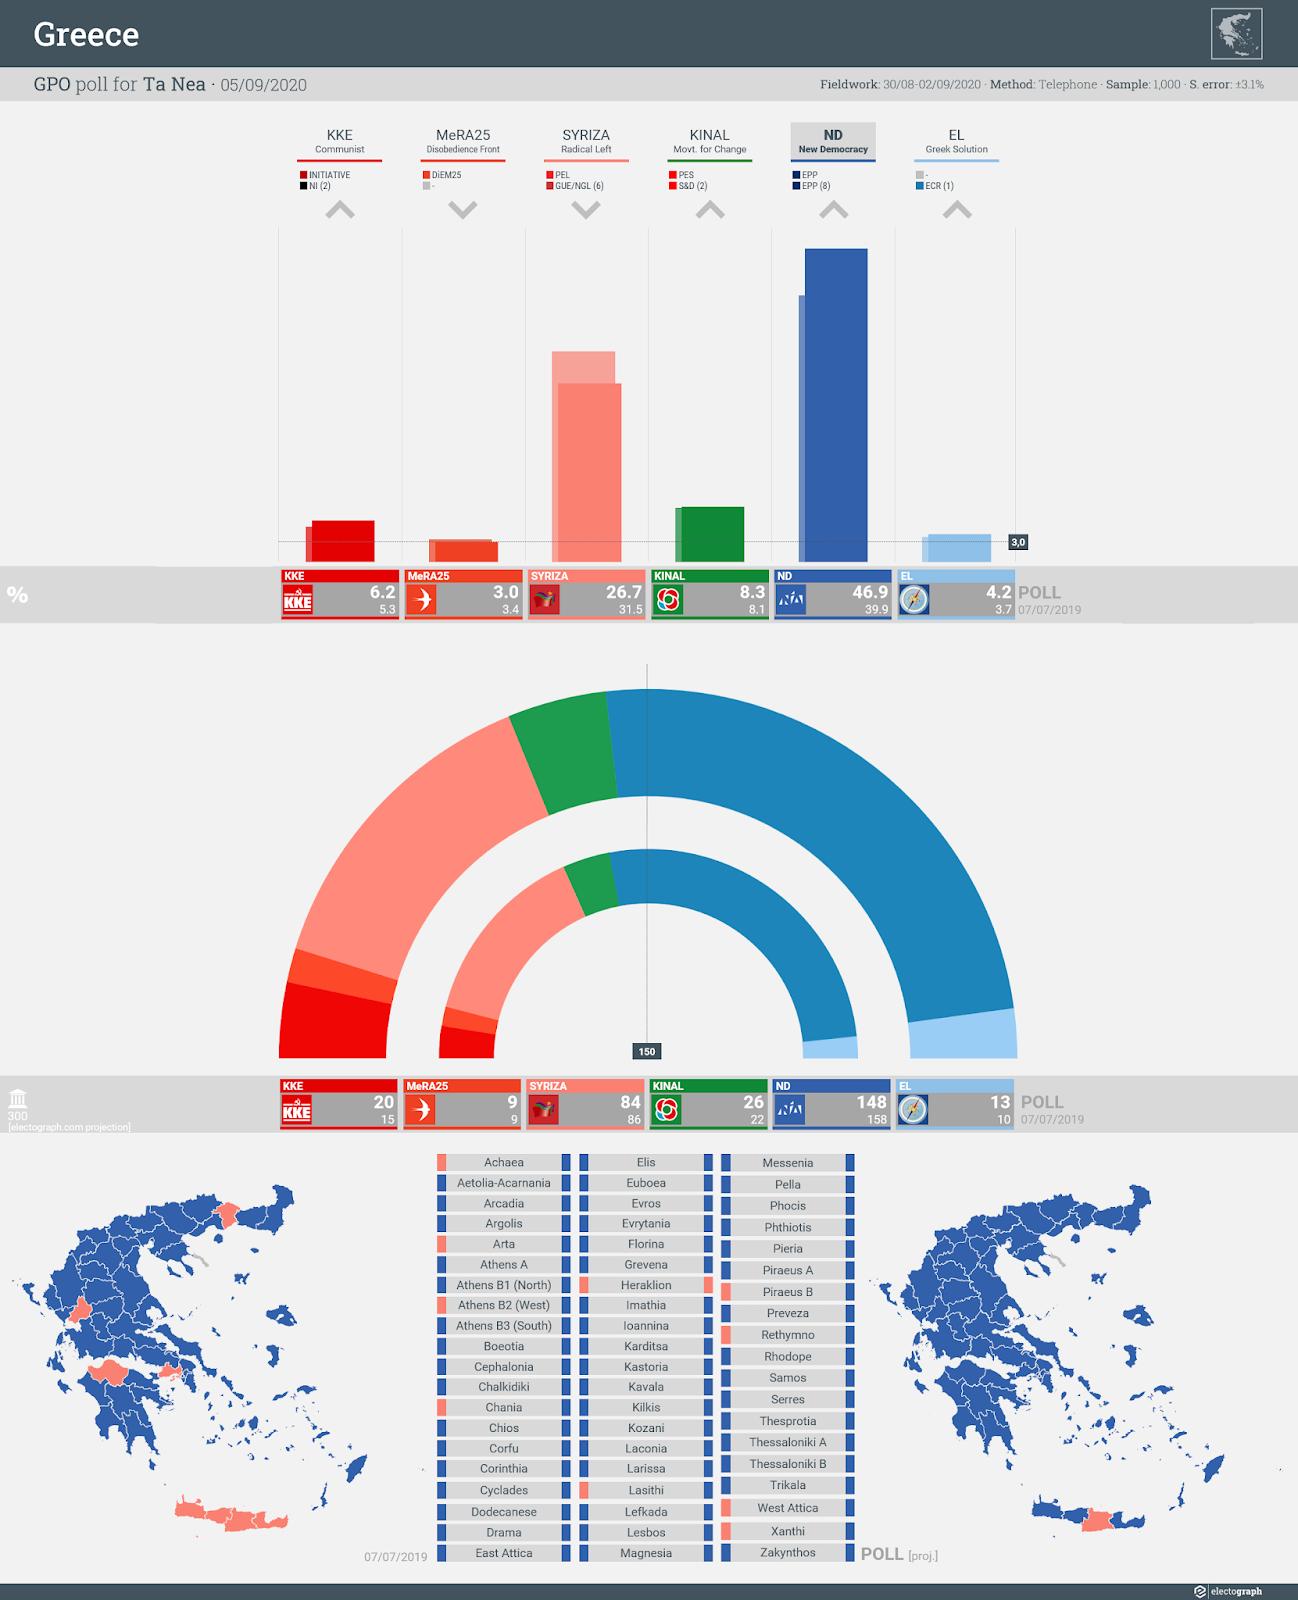 GREECE: GPO poll chart for Ta Nea, 5 September 2020